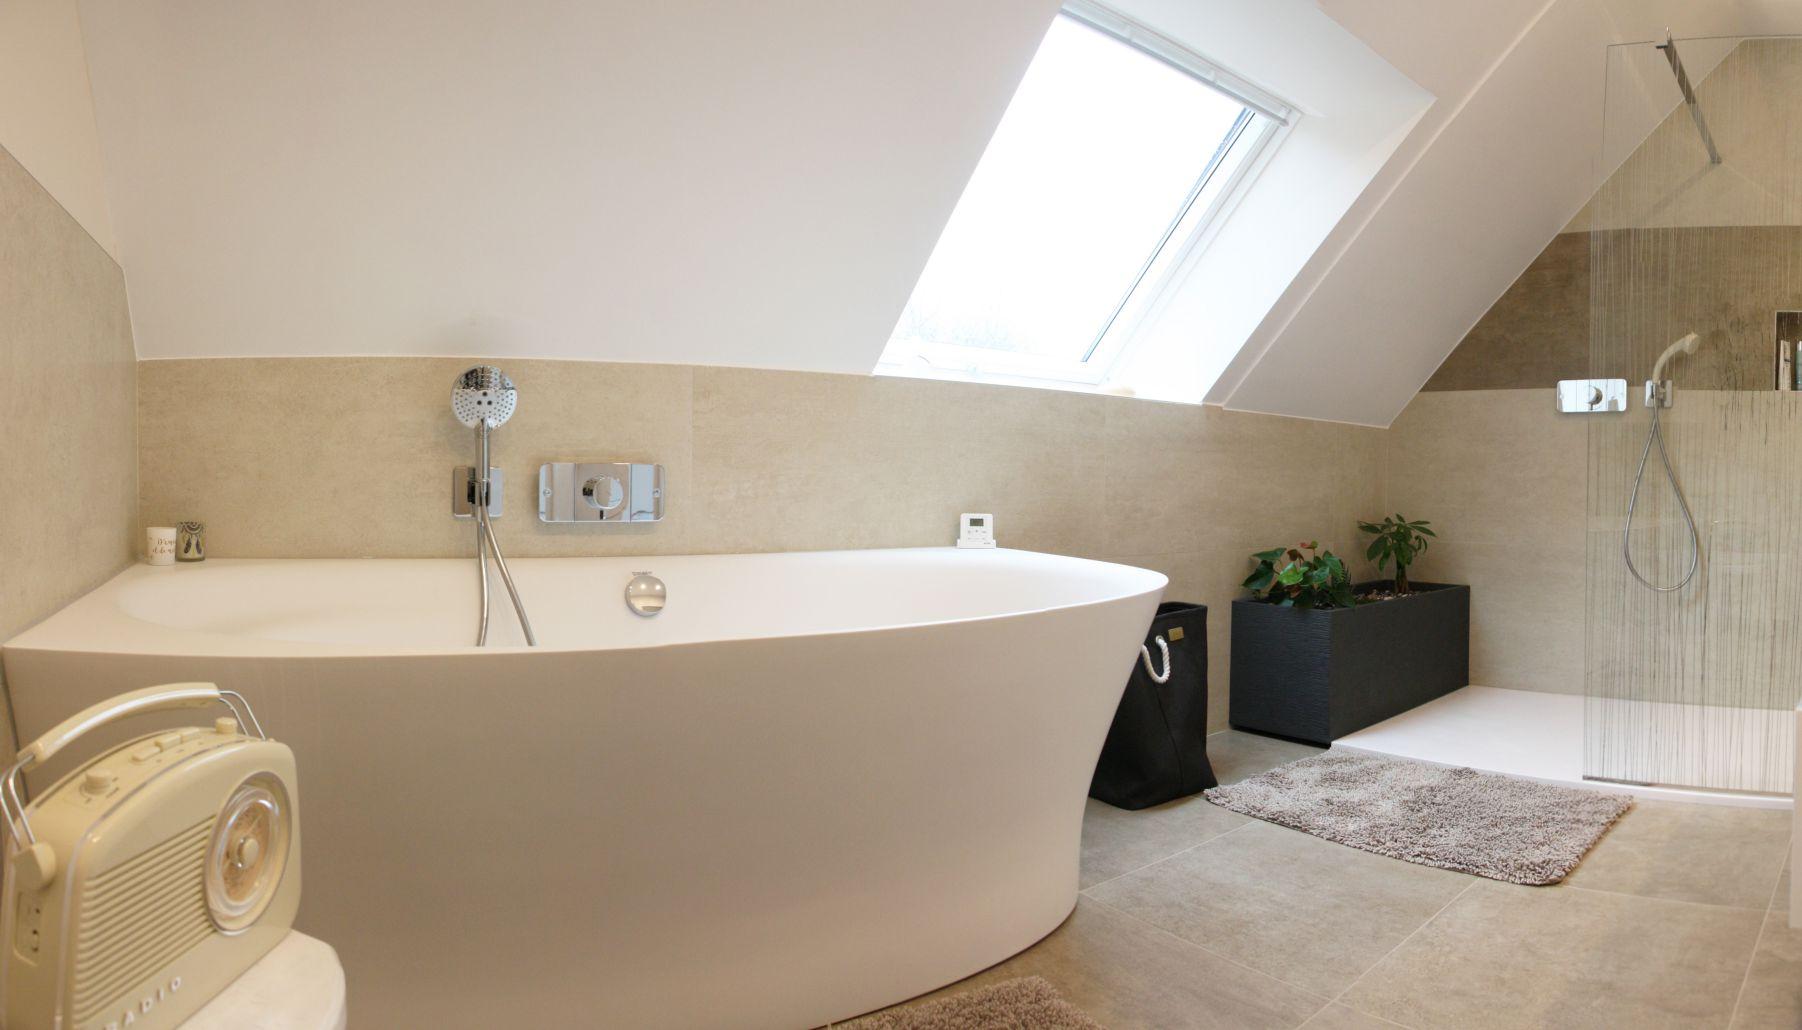 baignoire blanche grande avec beaucoup de style